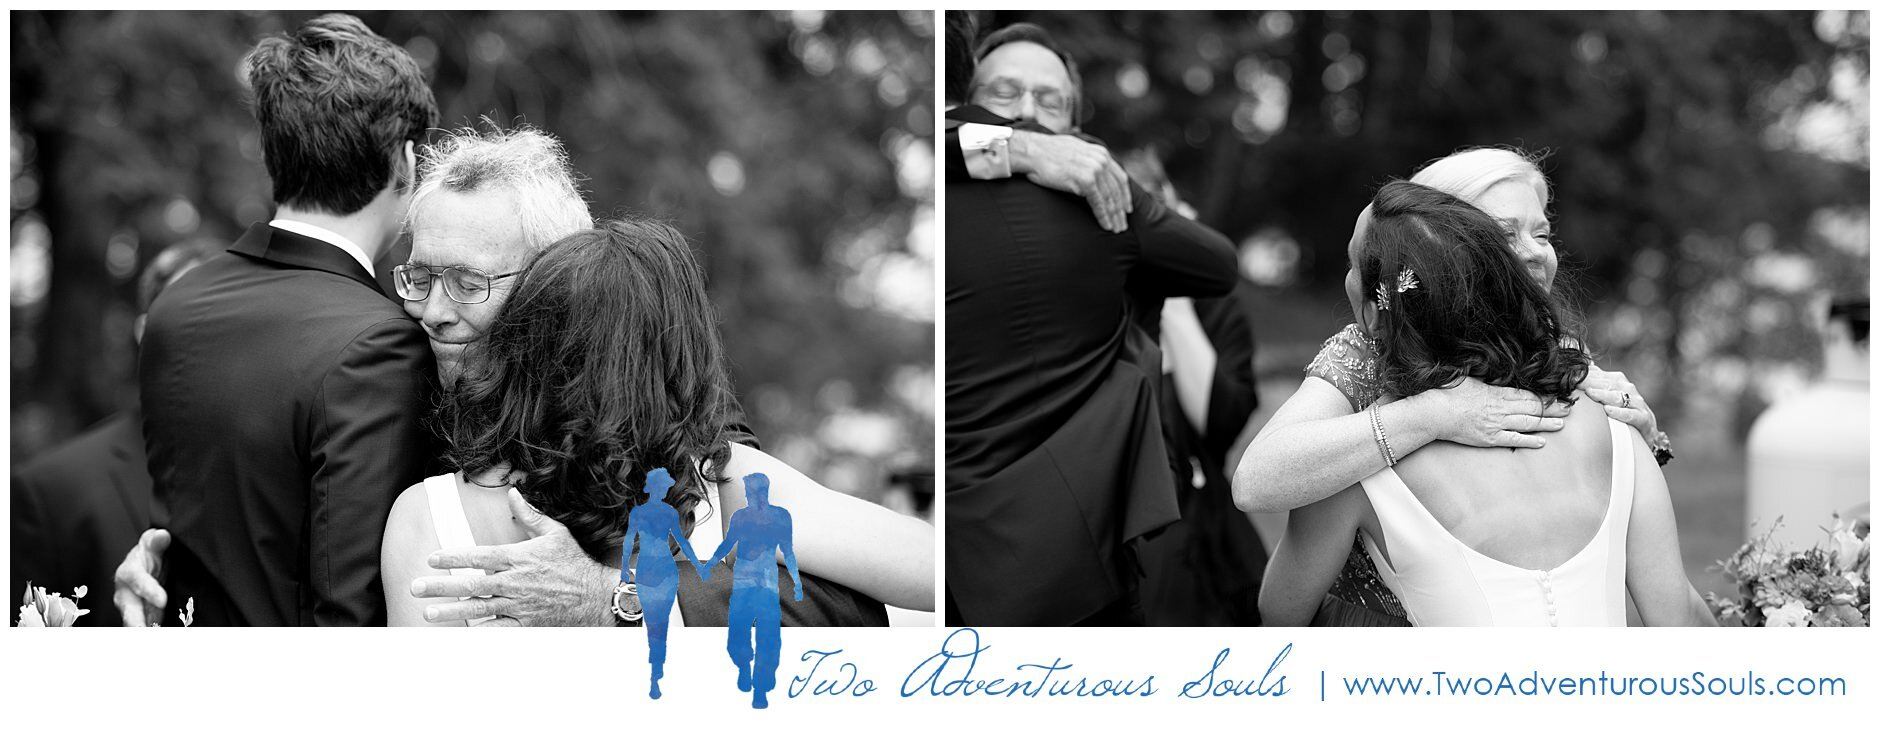 Bar Harbor Wedding Photographers, Acadia Bay Inn Wedding Photographers, Two Adventurous Souls- 091419_0026.jpg